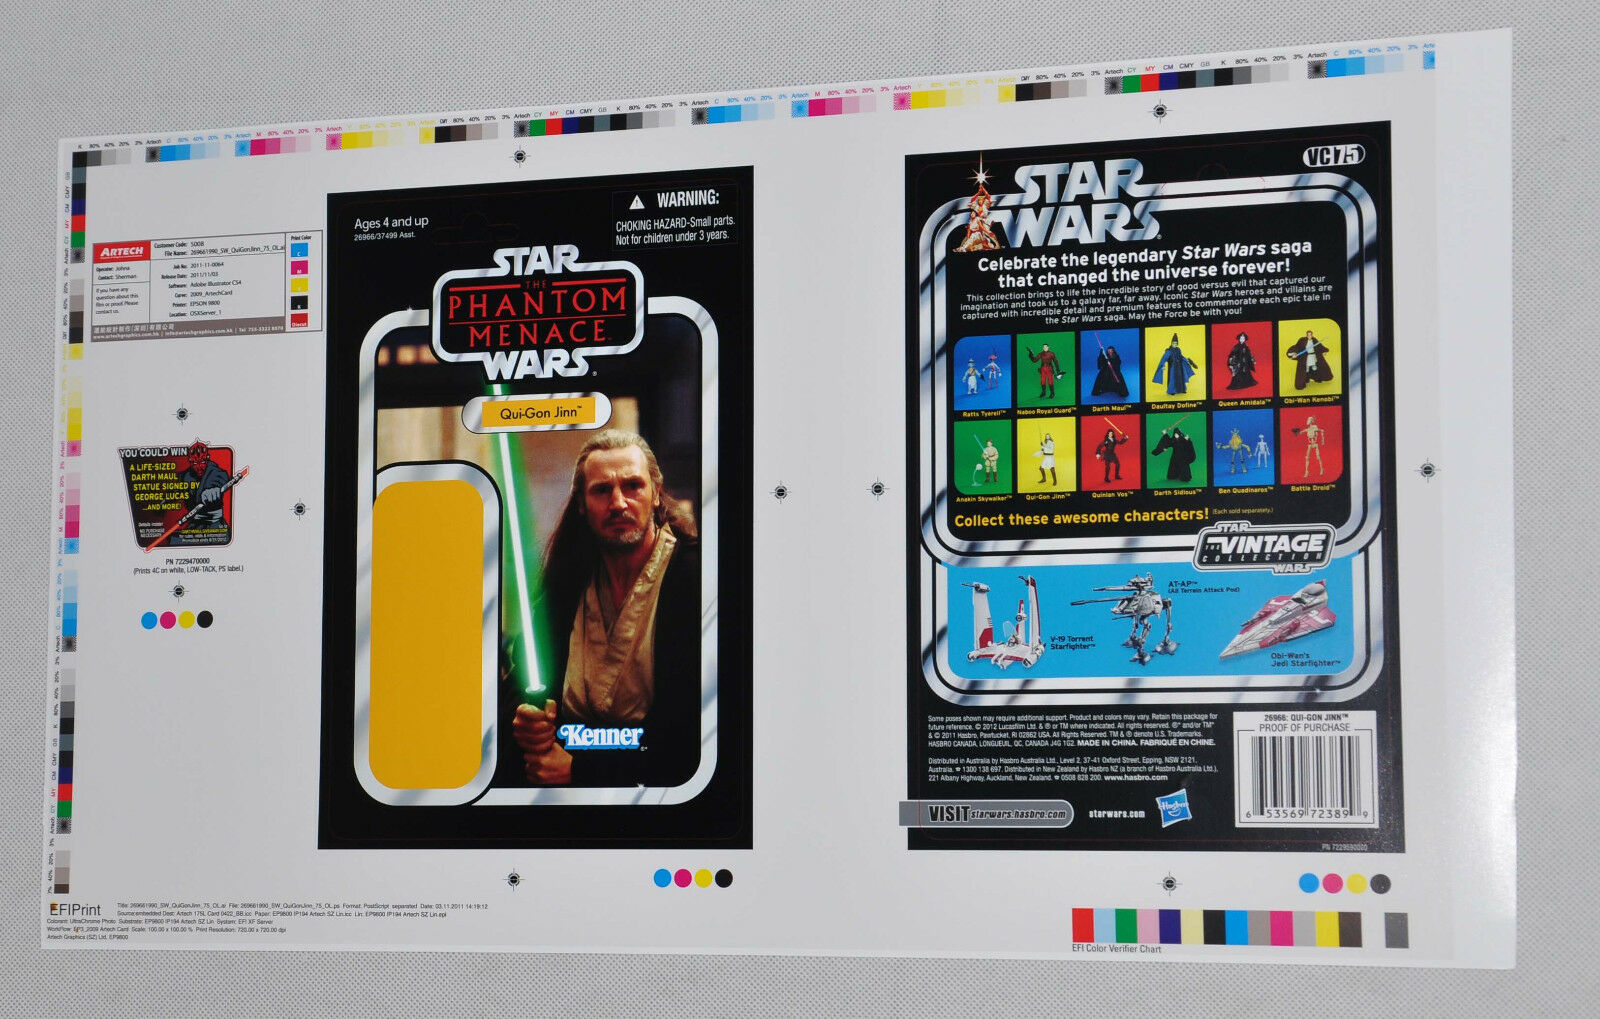 Star wars the vintage 2012 qui gon jinn  proof card sheet predotype